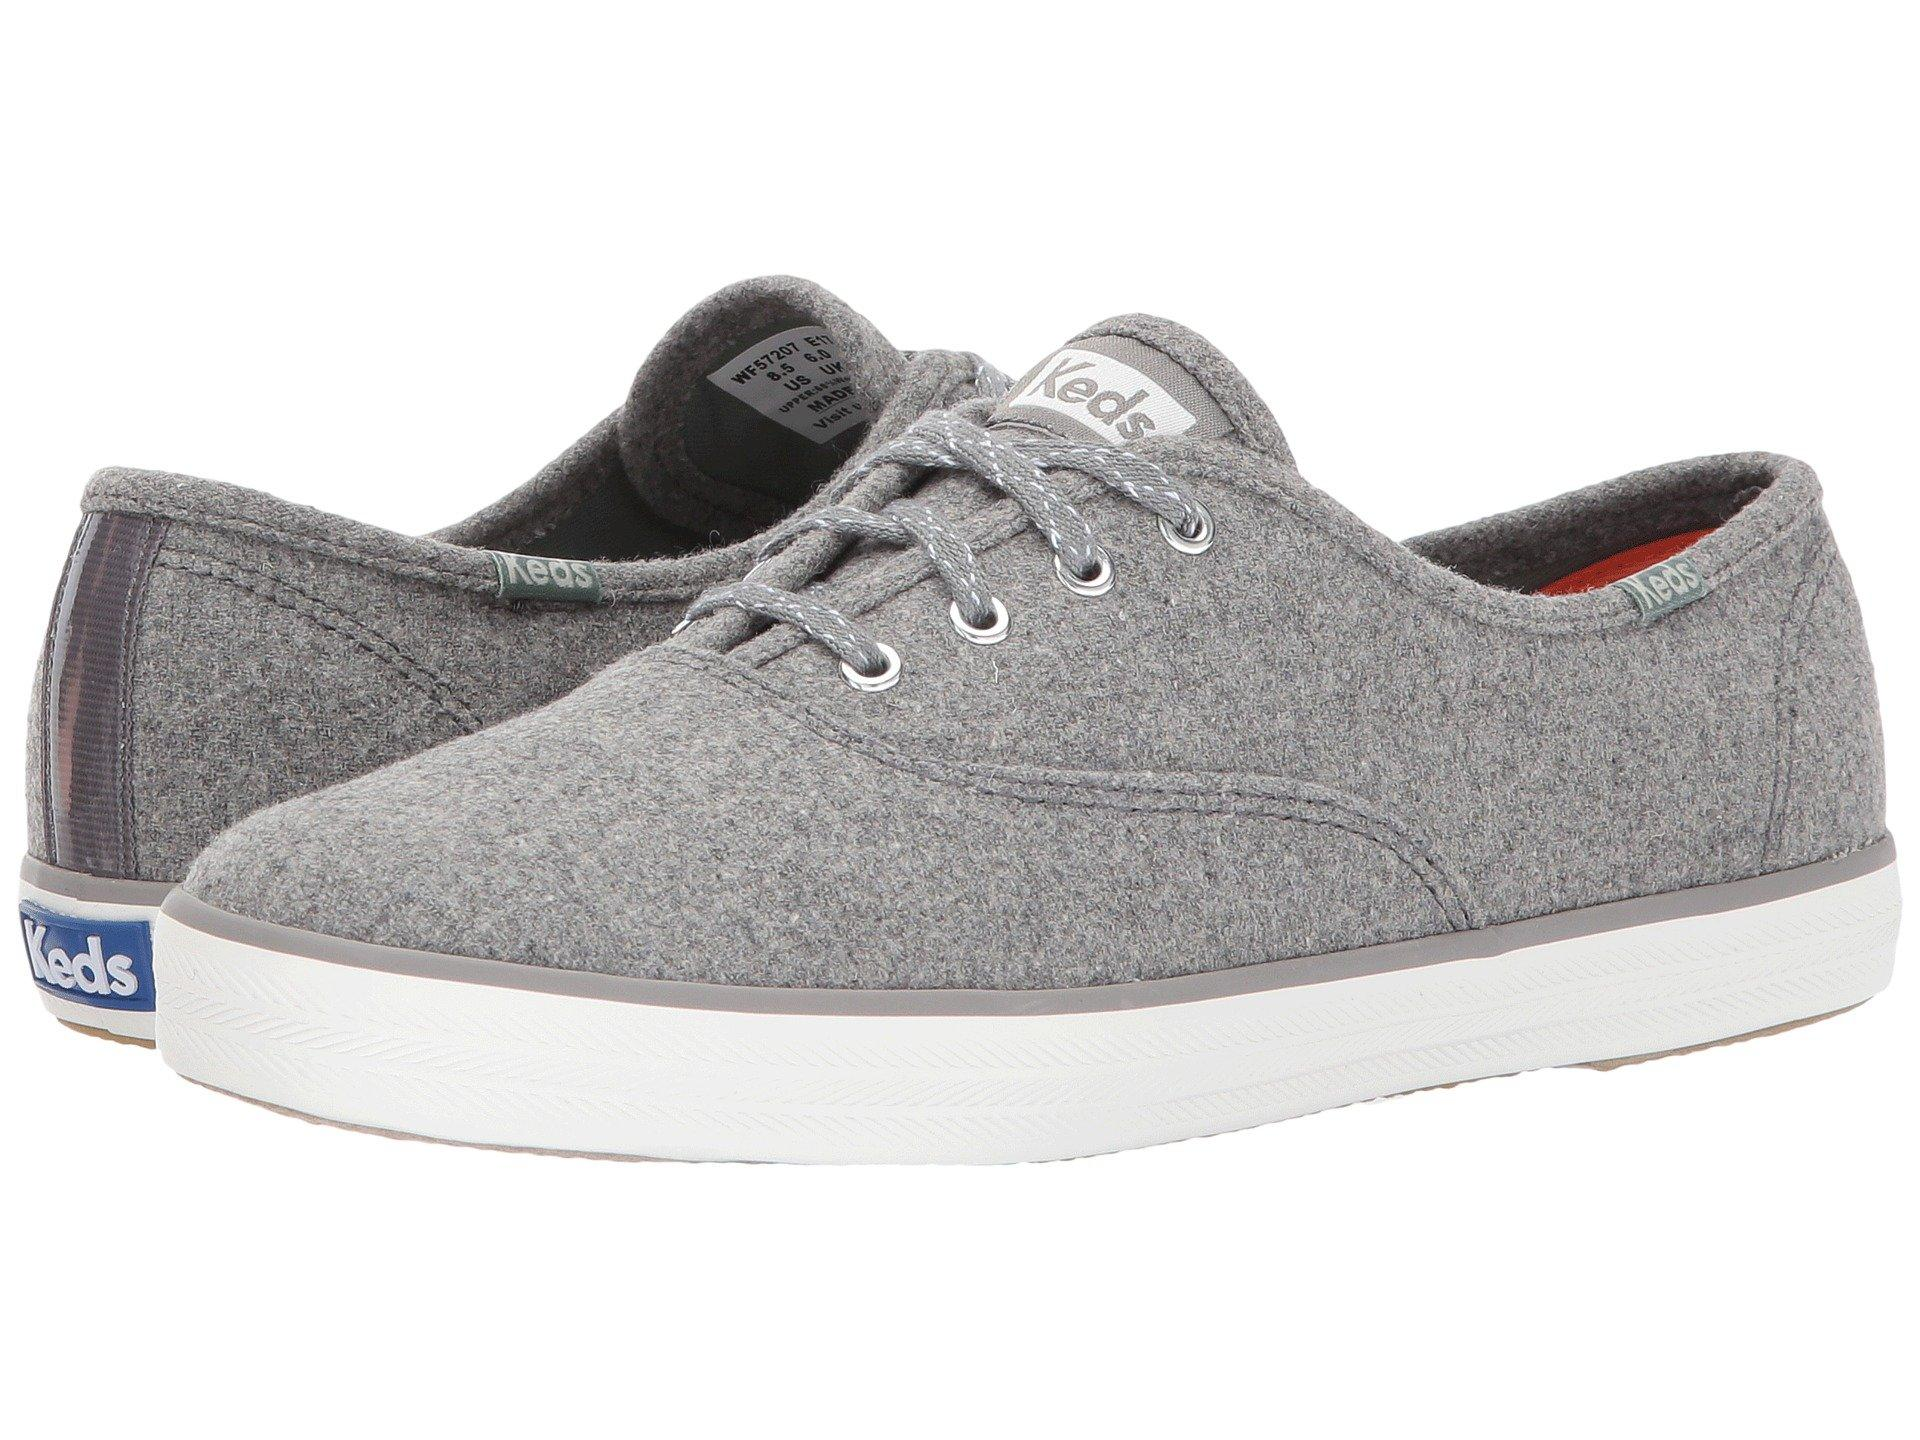 f185f3b82a0 Keds Champion Wool In Gray